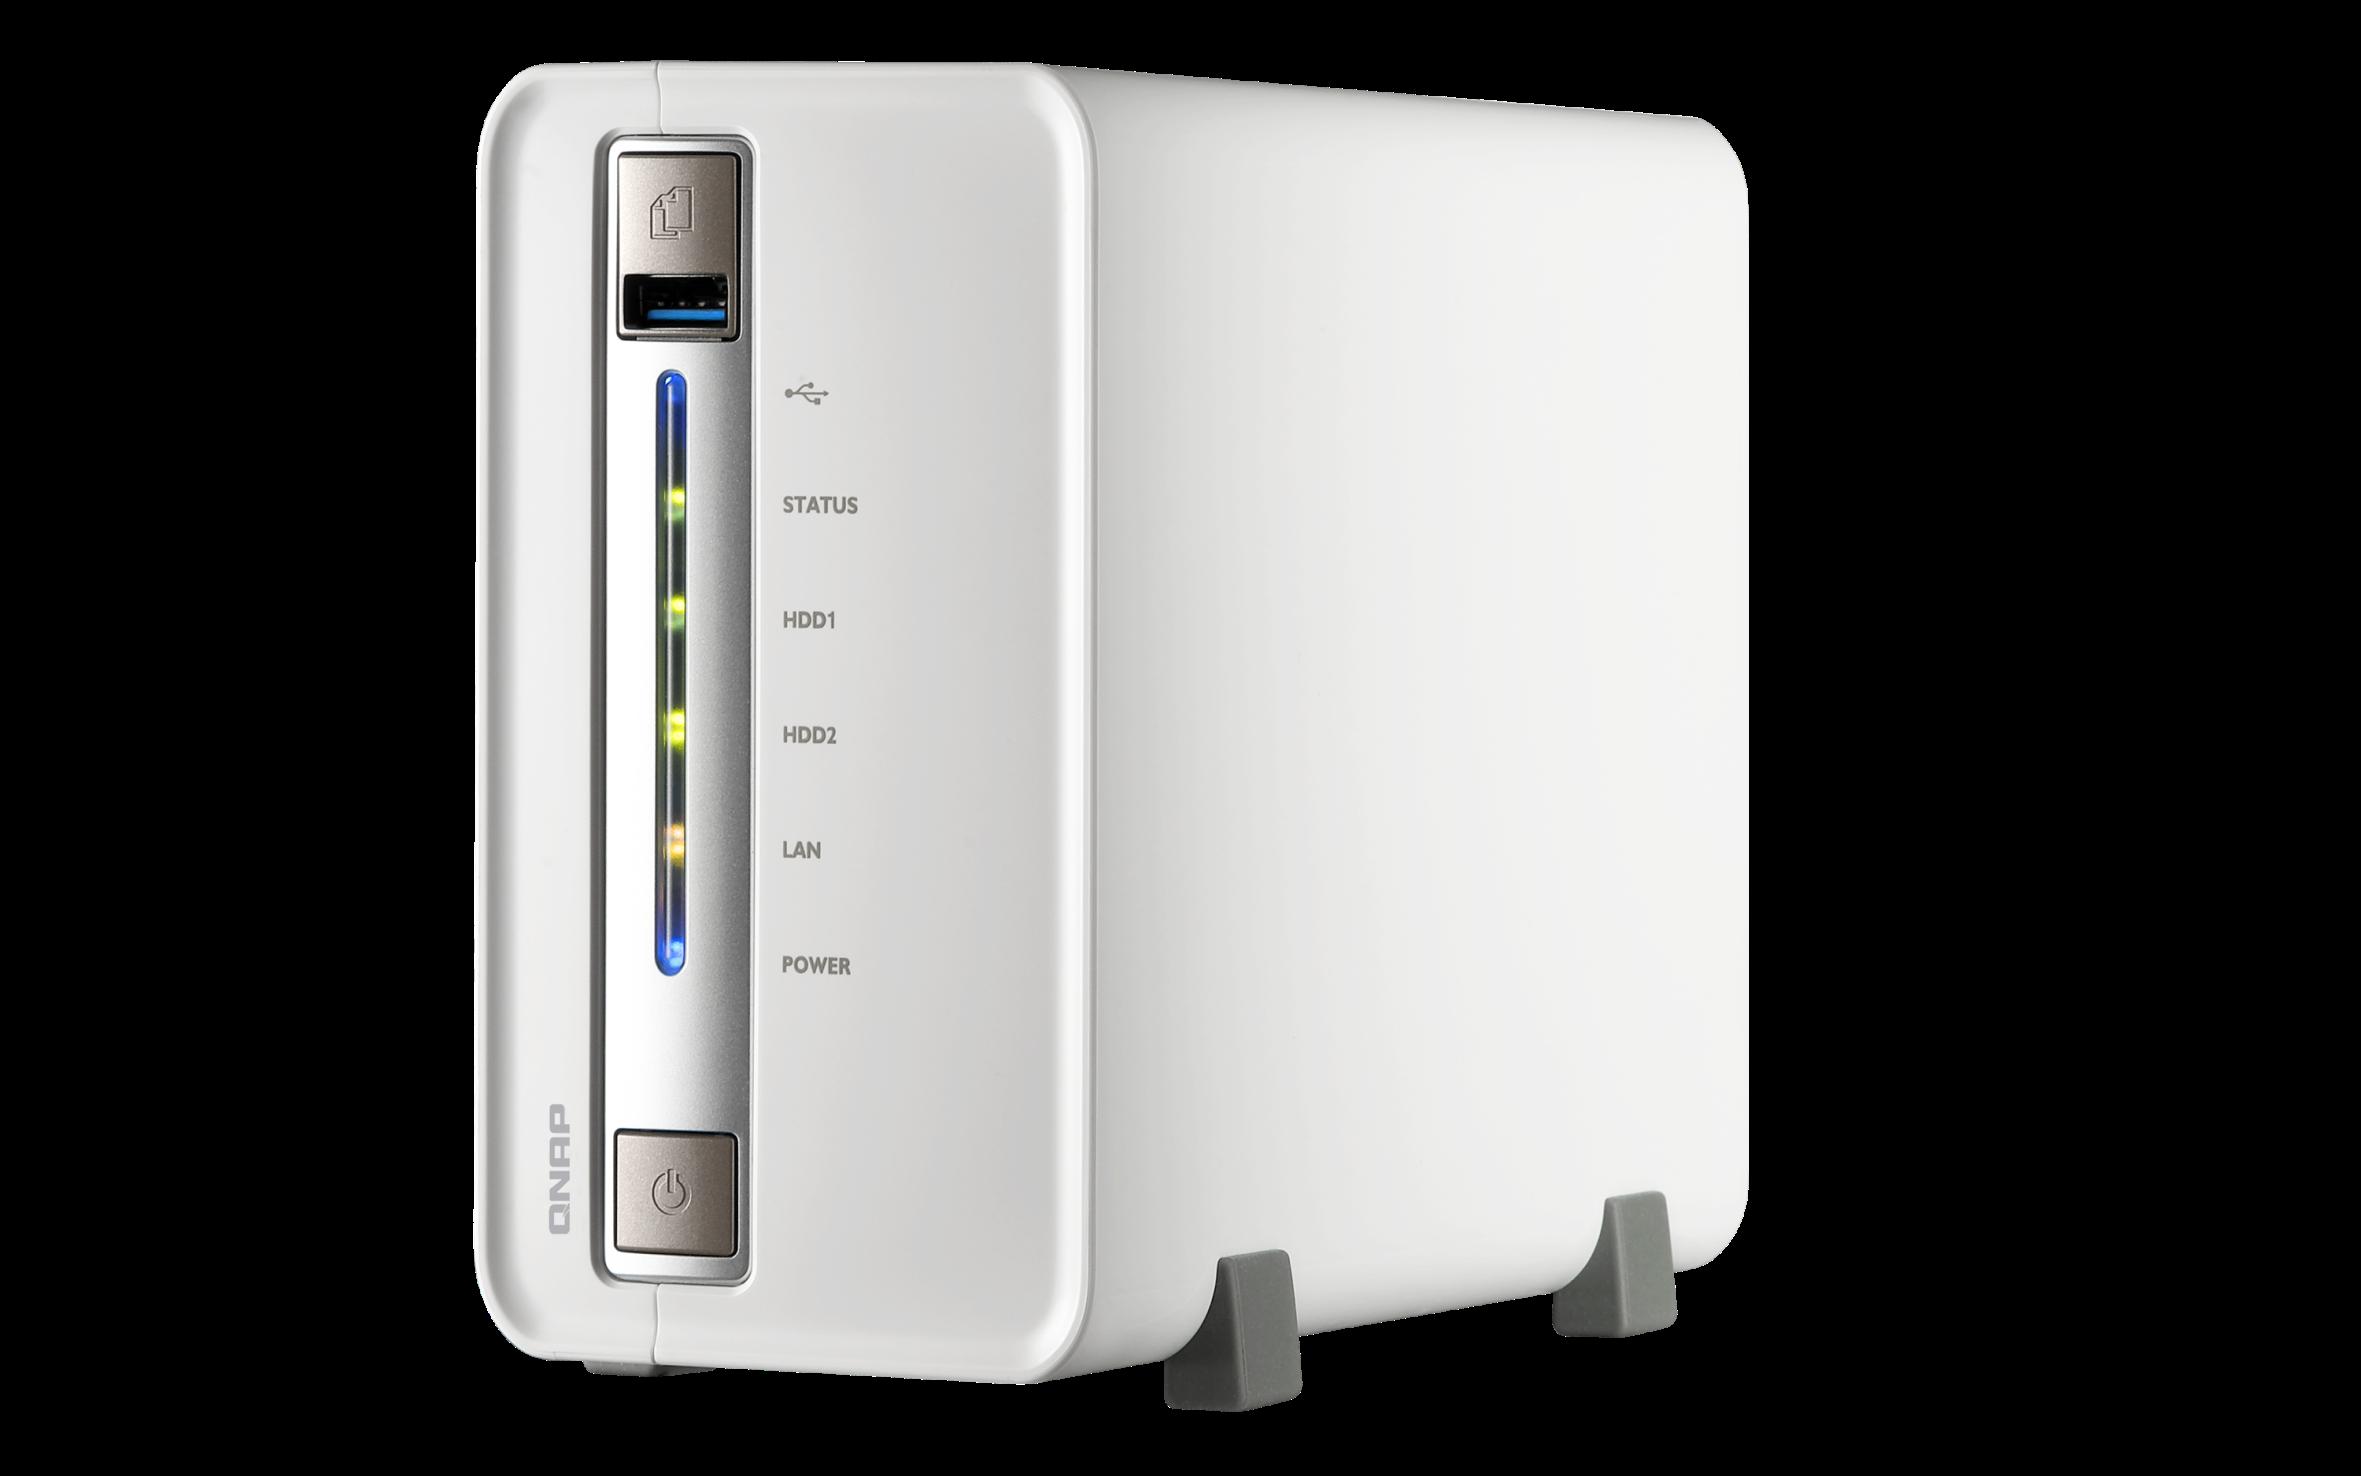 QNAP TS-251C (2,41GHz/1GB RAM/2xSATA)